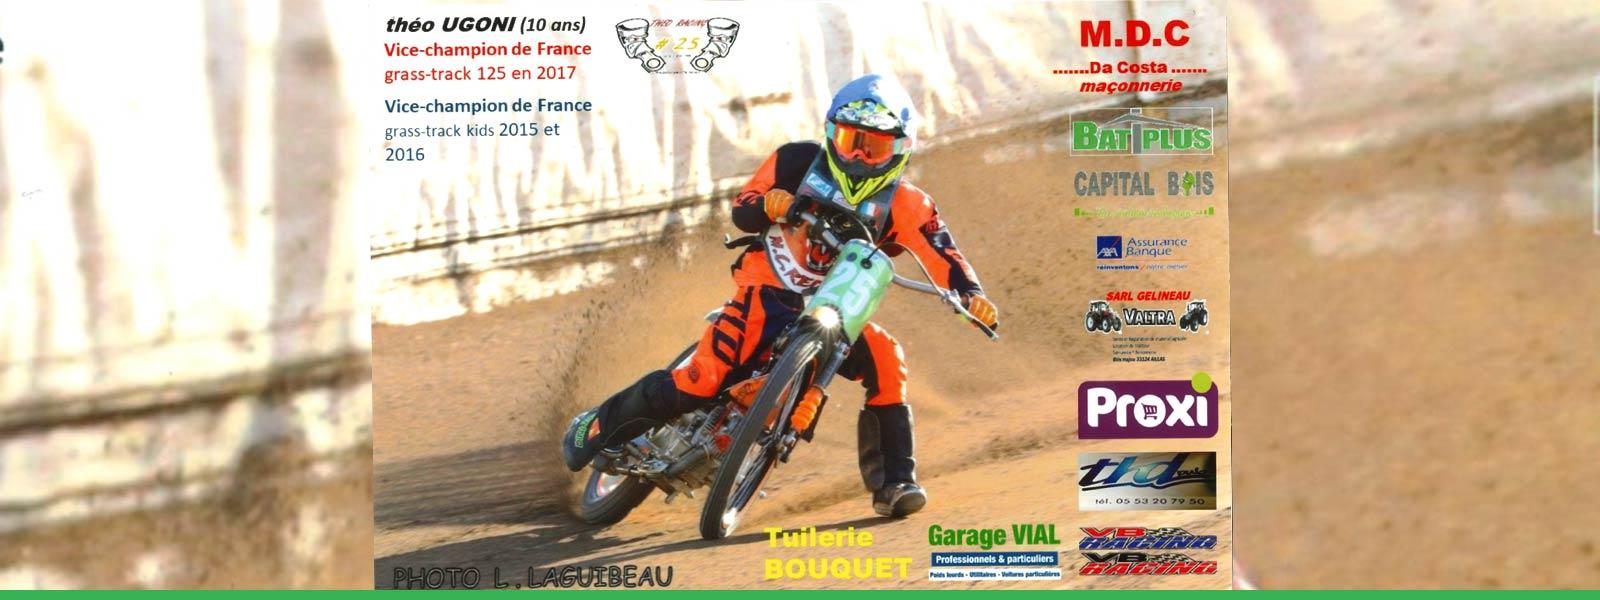 Le garage Vial sponsorise le jeune prodige du grass-track, Théo Ugoni